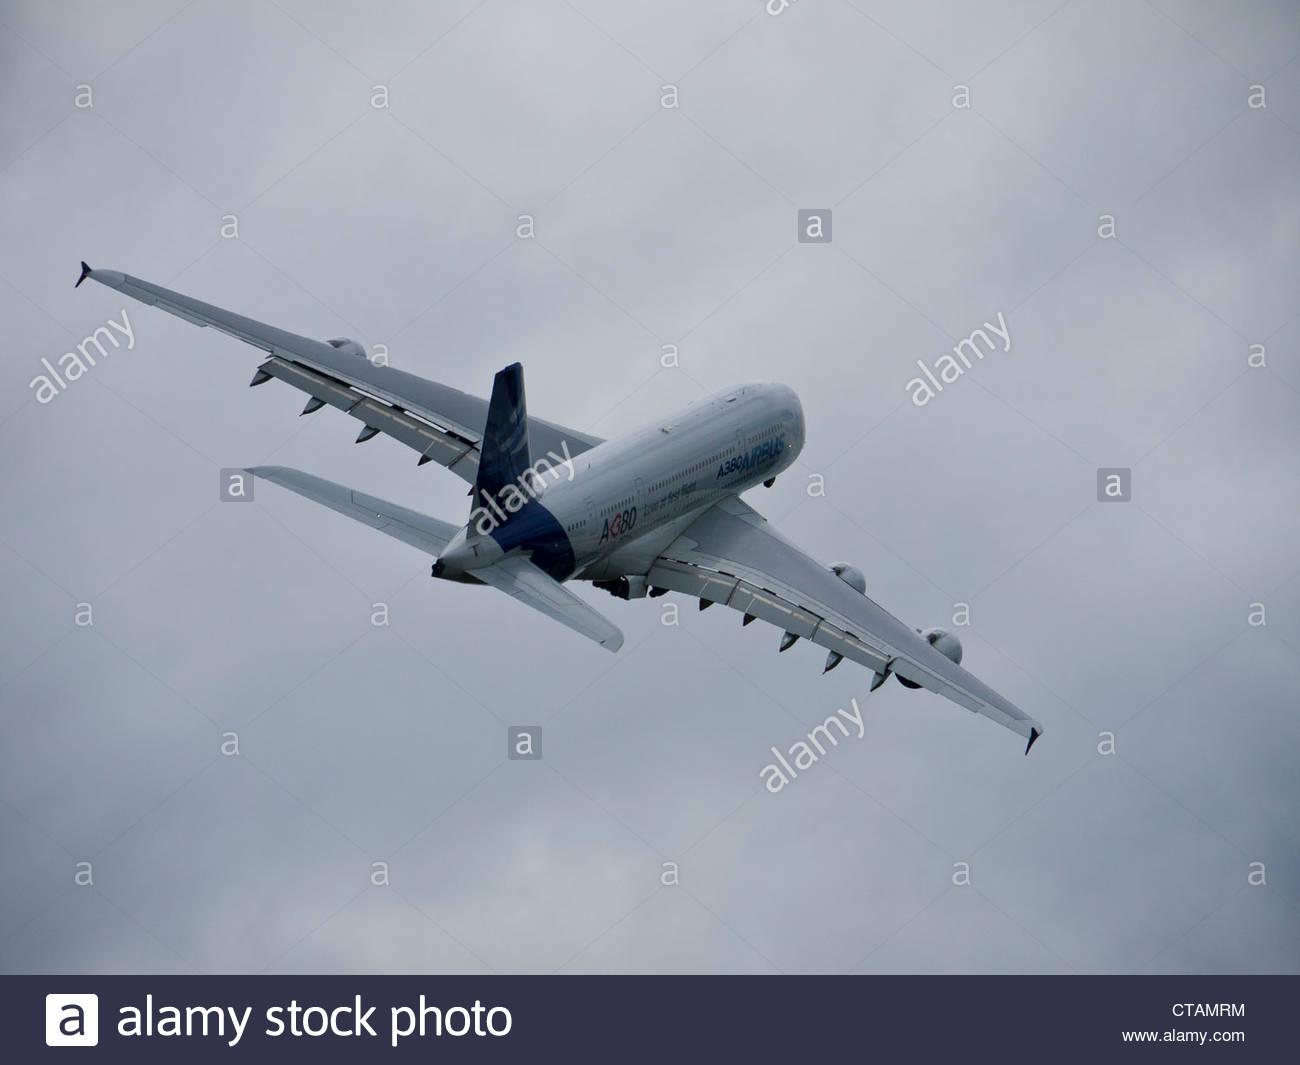 Airbus A380 Airbourne Farnborough 2012 - Stock Image